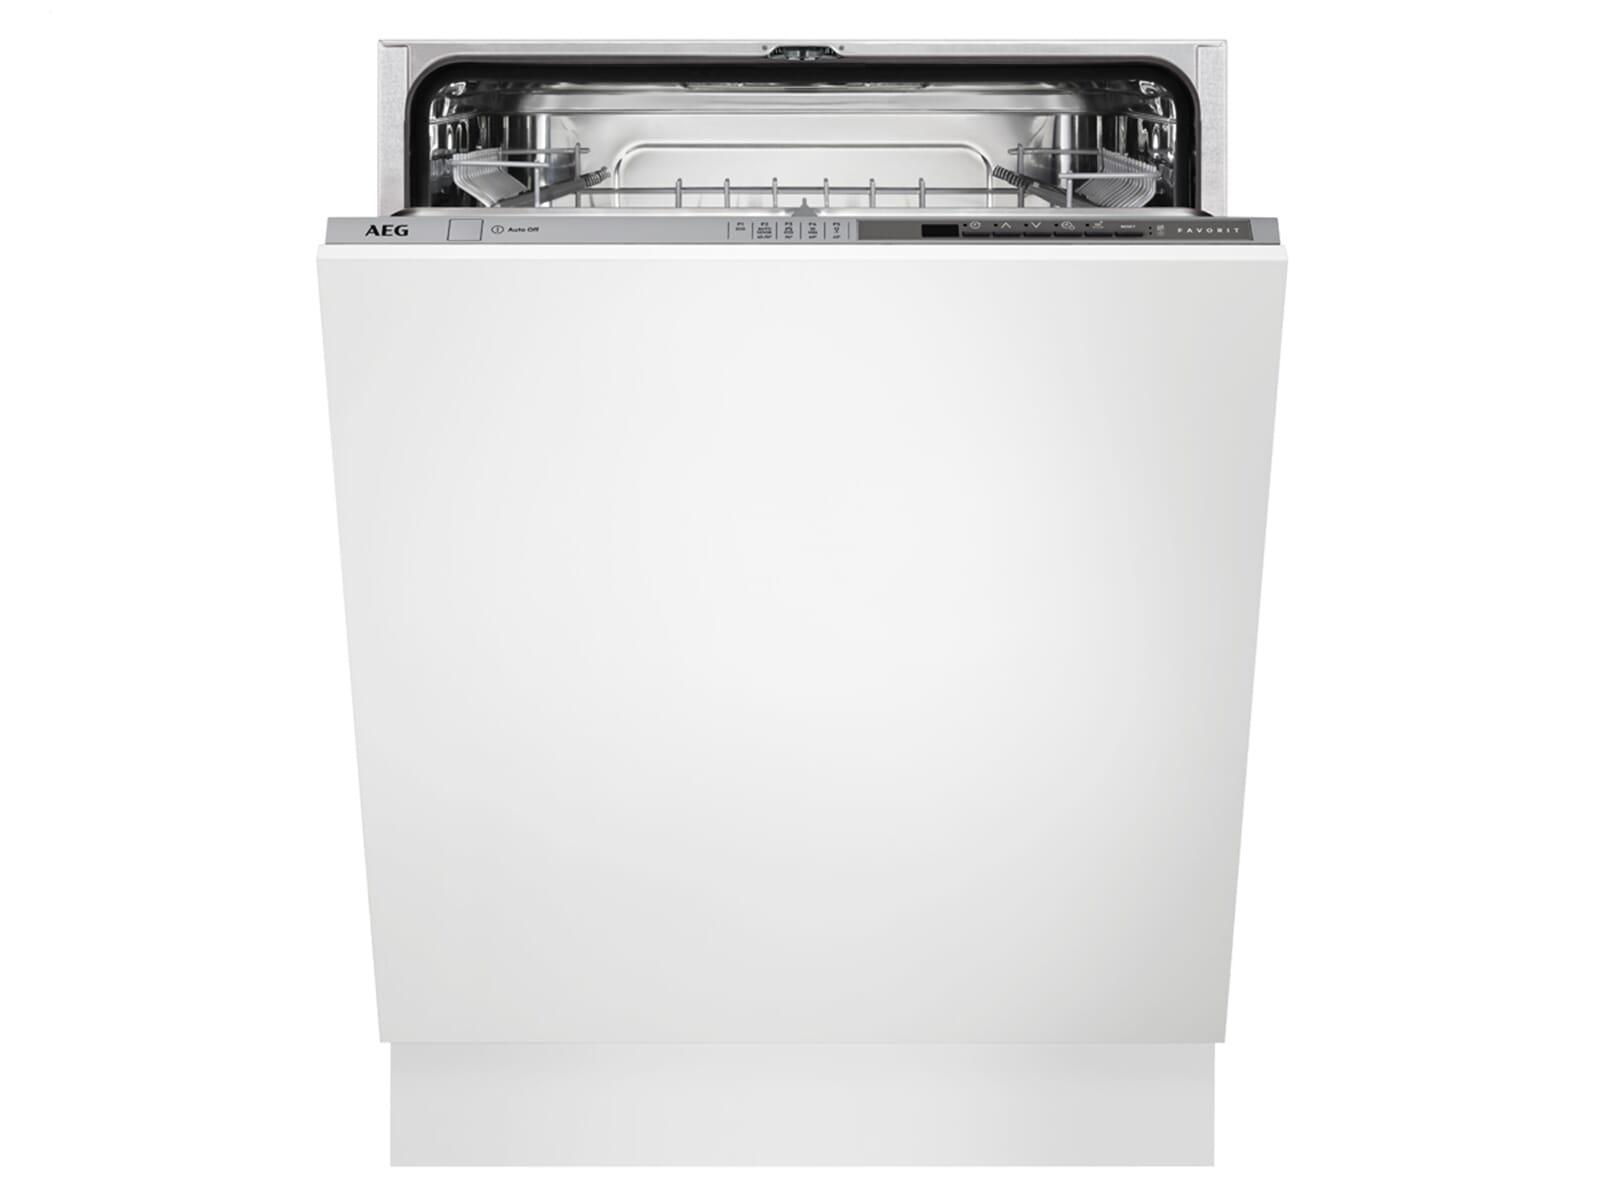 Aeg Kühlschrank Montageanleitung : Aeg fsb z vollintegrierbarer einbaugeschirrspüler